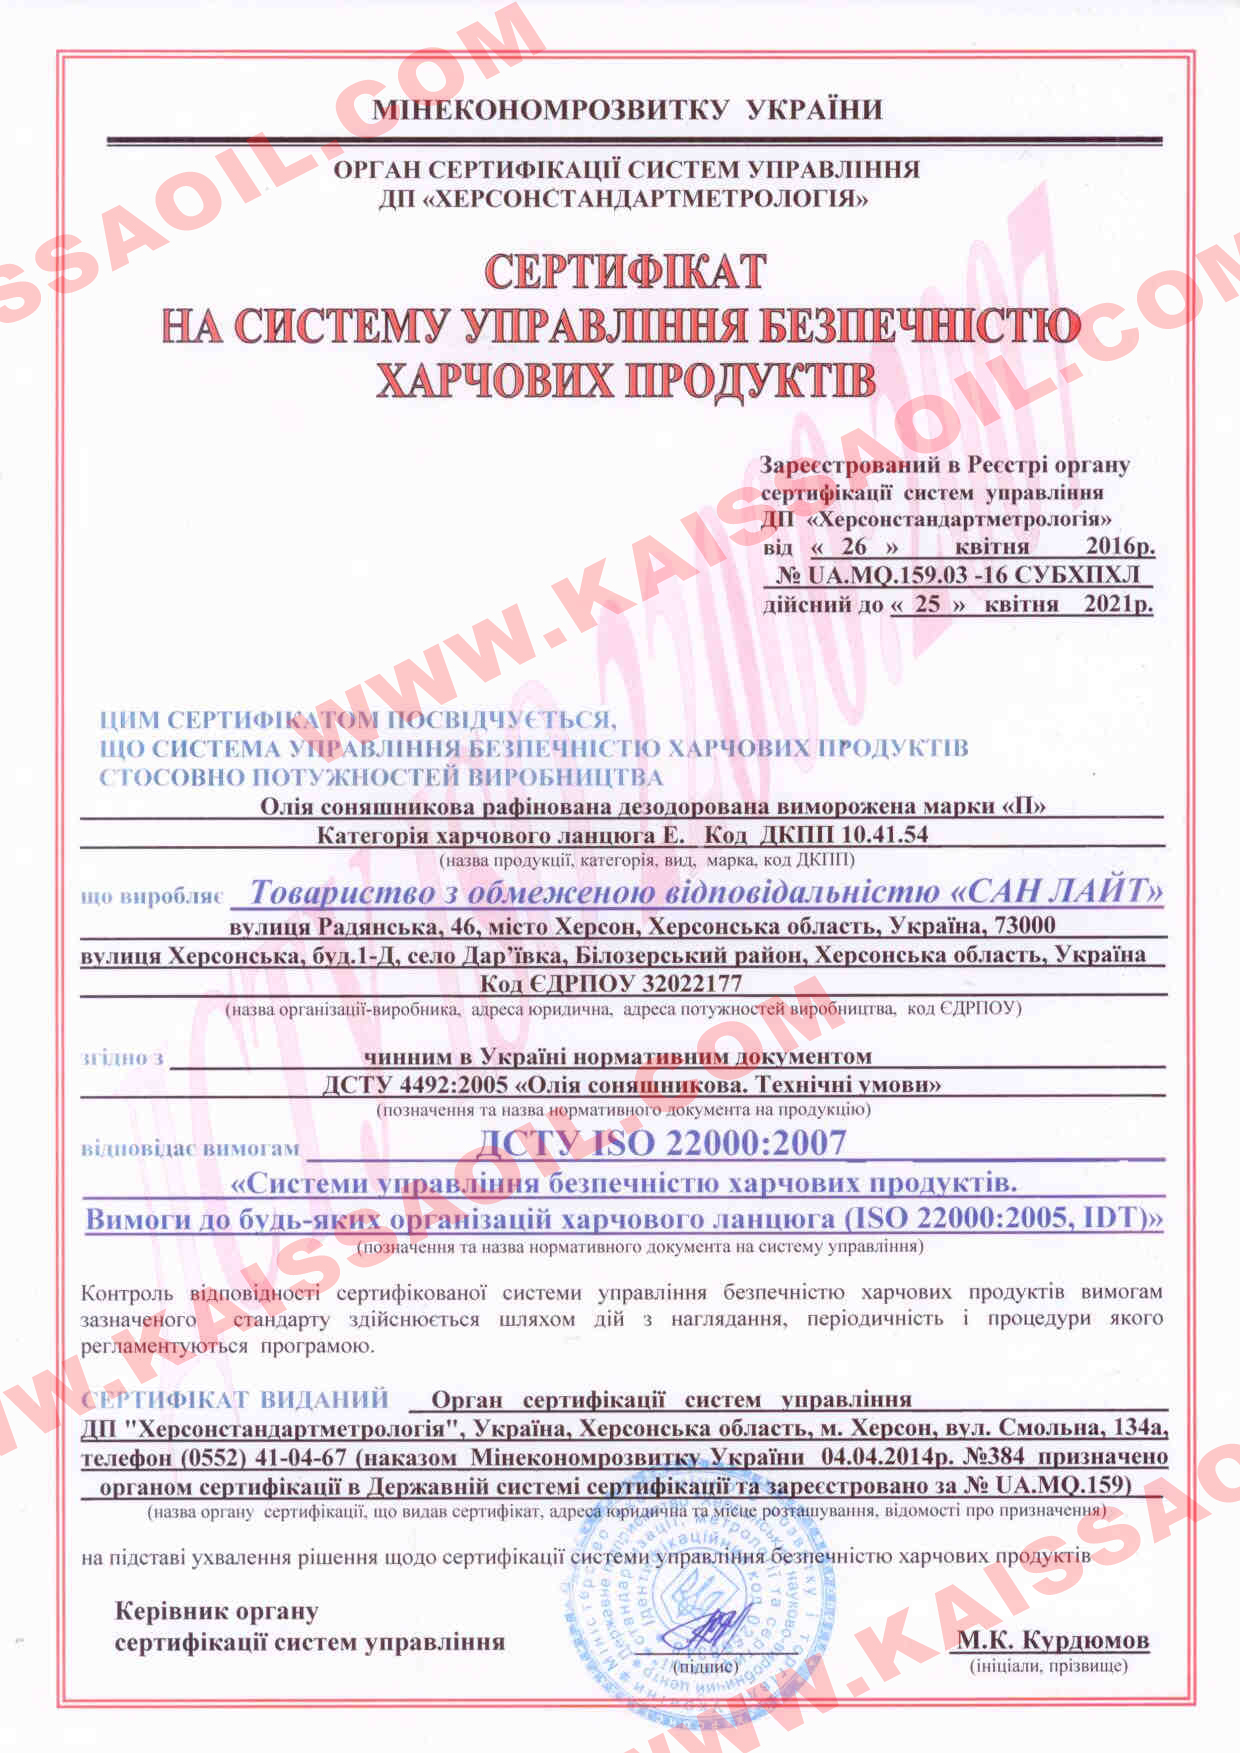 Сертификат ДСТУ ISO 22000:2007